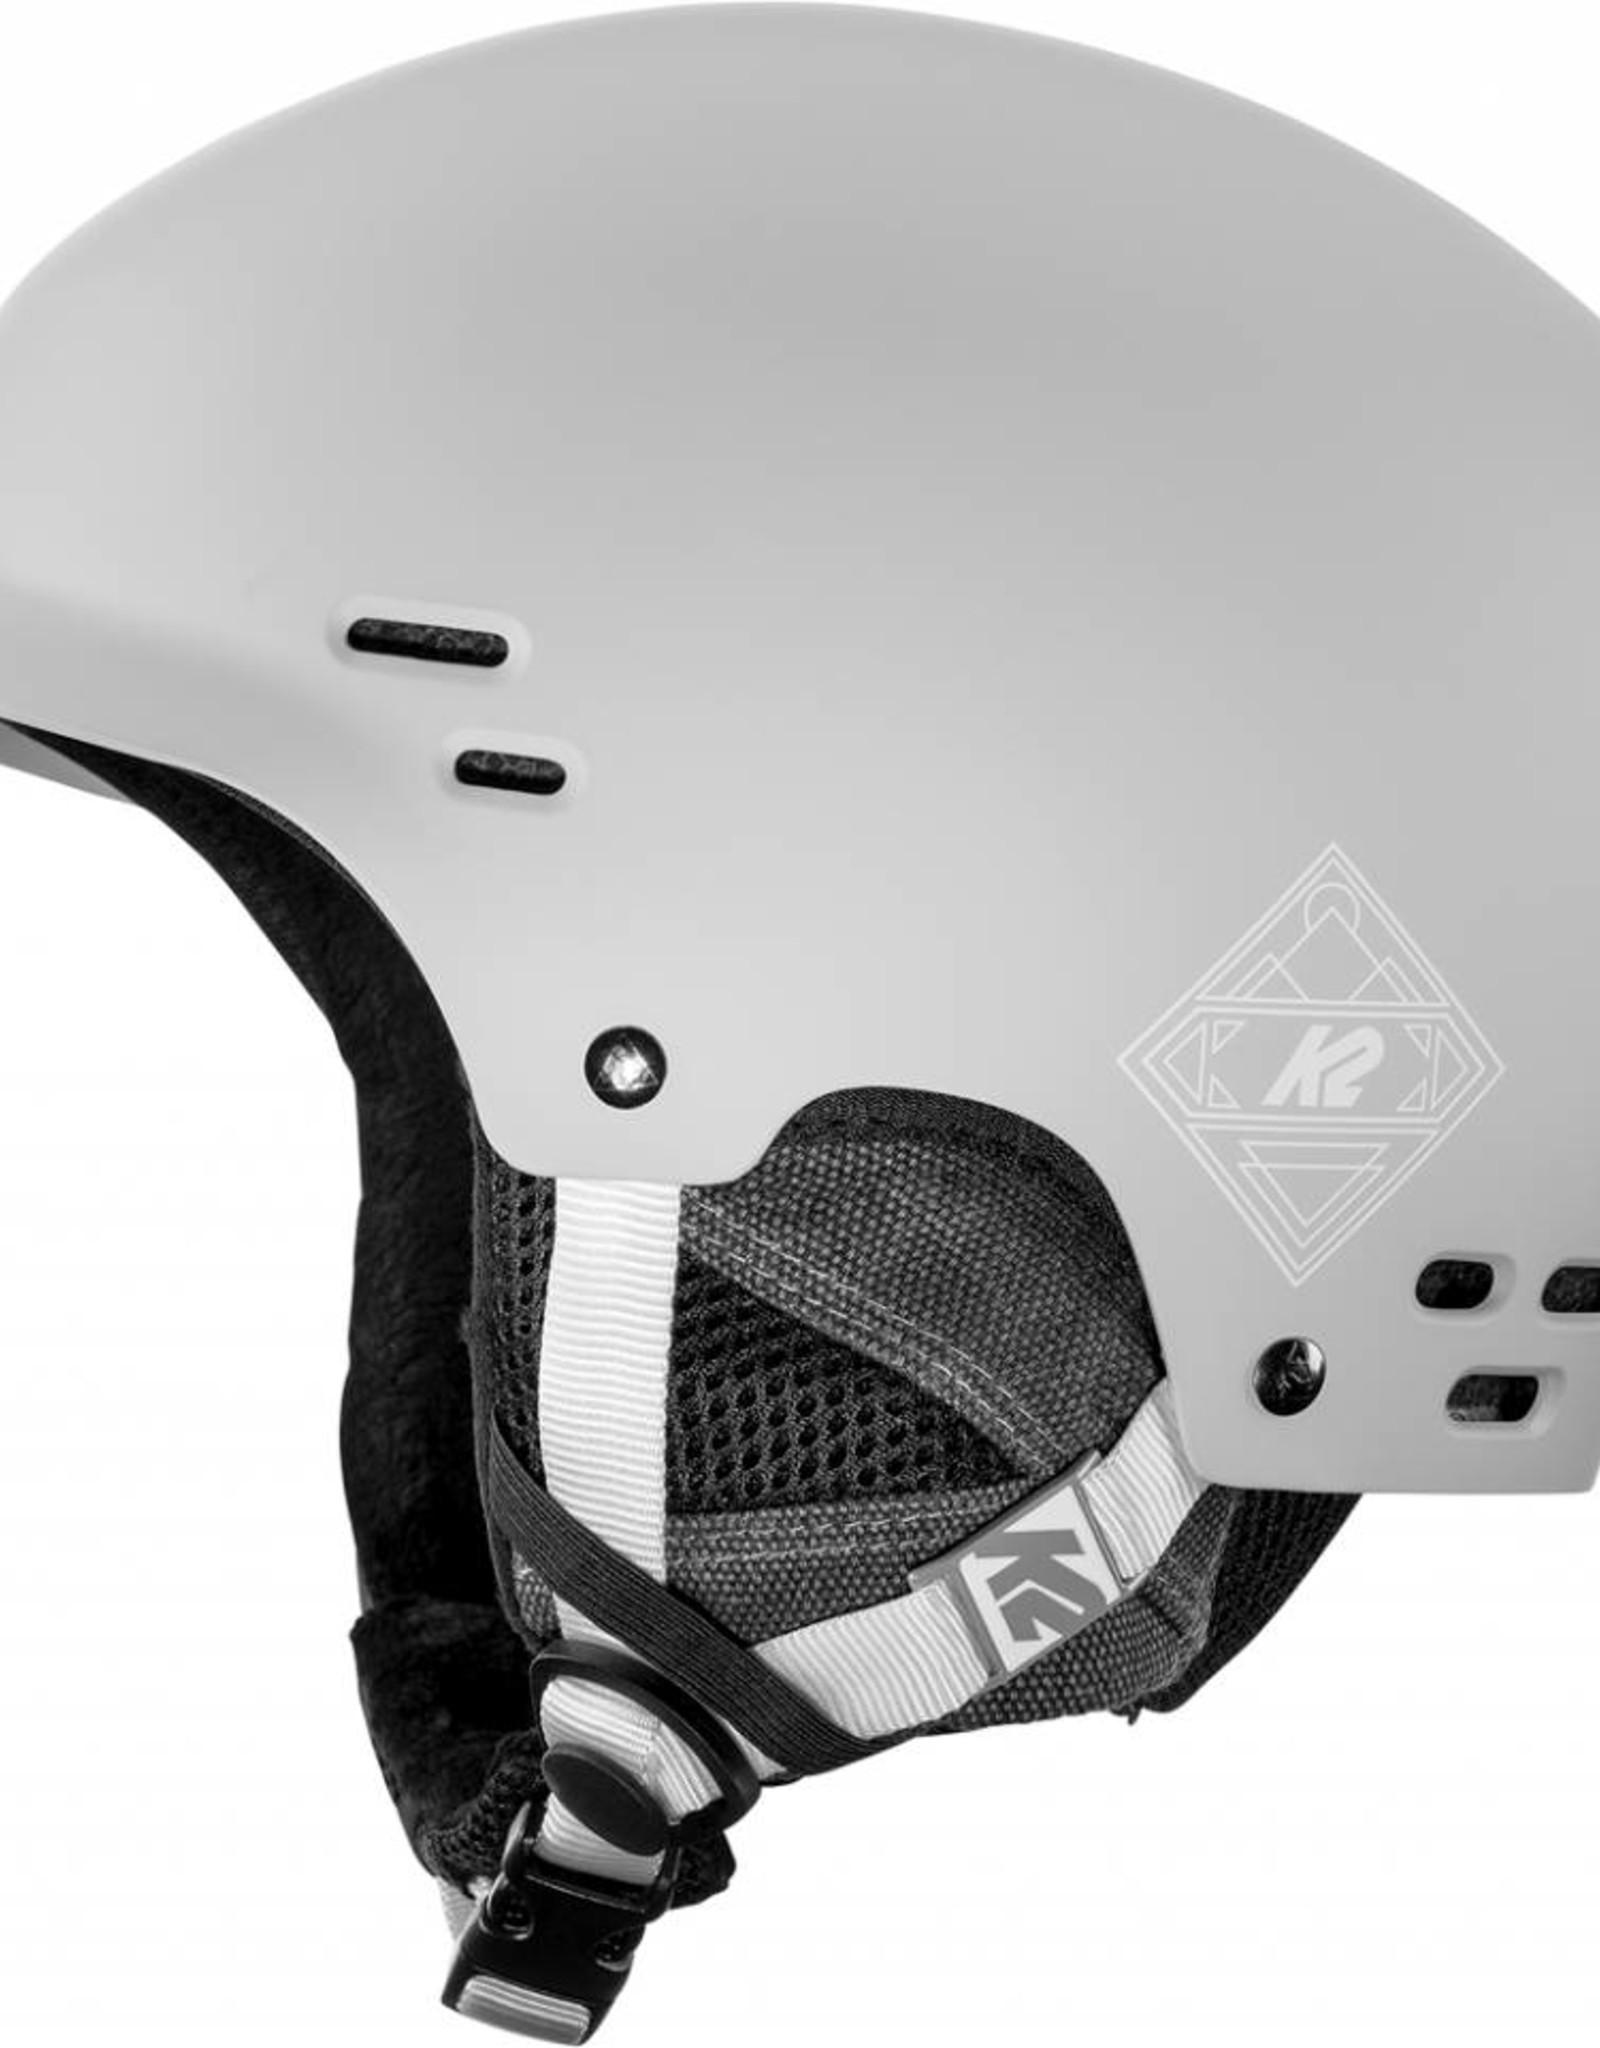 K2 - THRIVE Helmet - Grey -